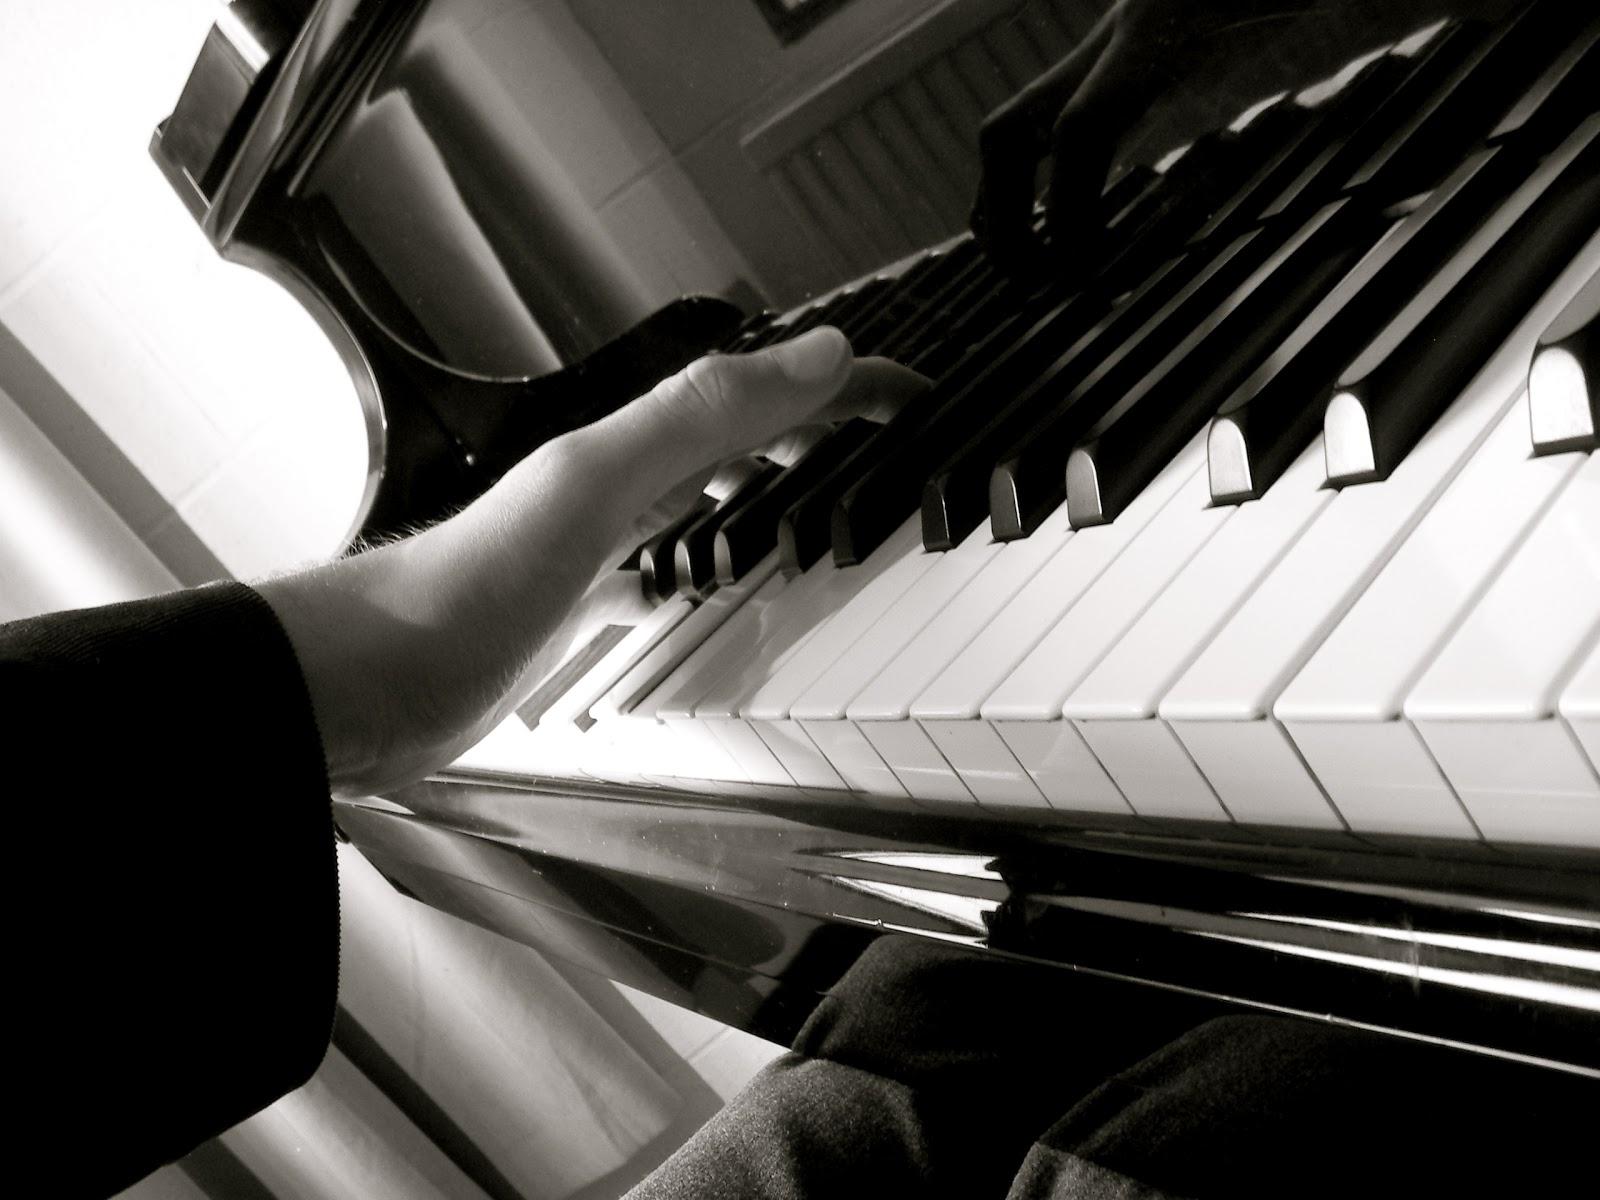 http://3.bp.blogspot.com/-OZCrx4mXWZ0/TqkKeDD2v1I/AAAAAAAAAEg/opCBT7_6tWw/s1600/piano01.jpg